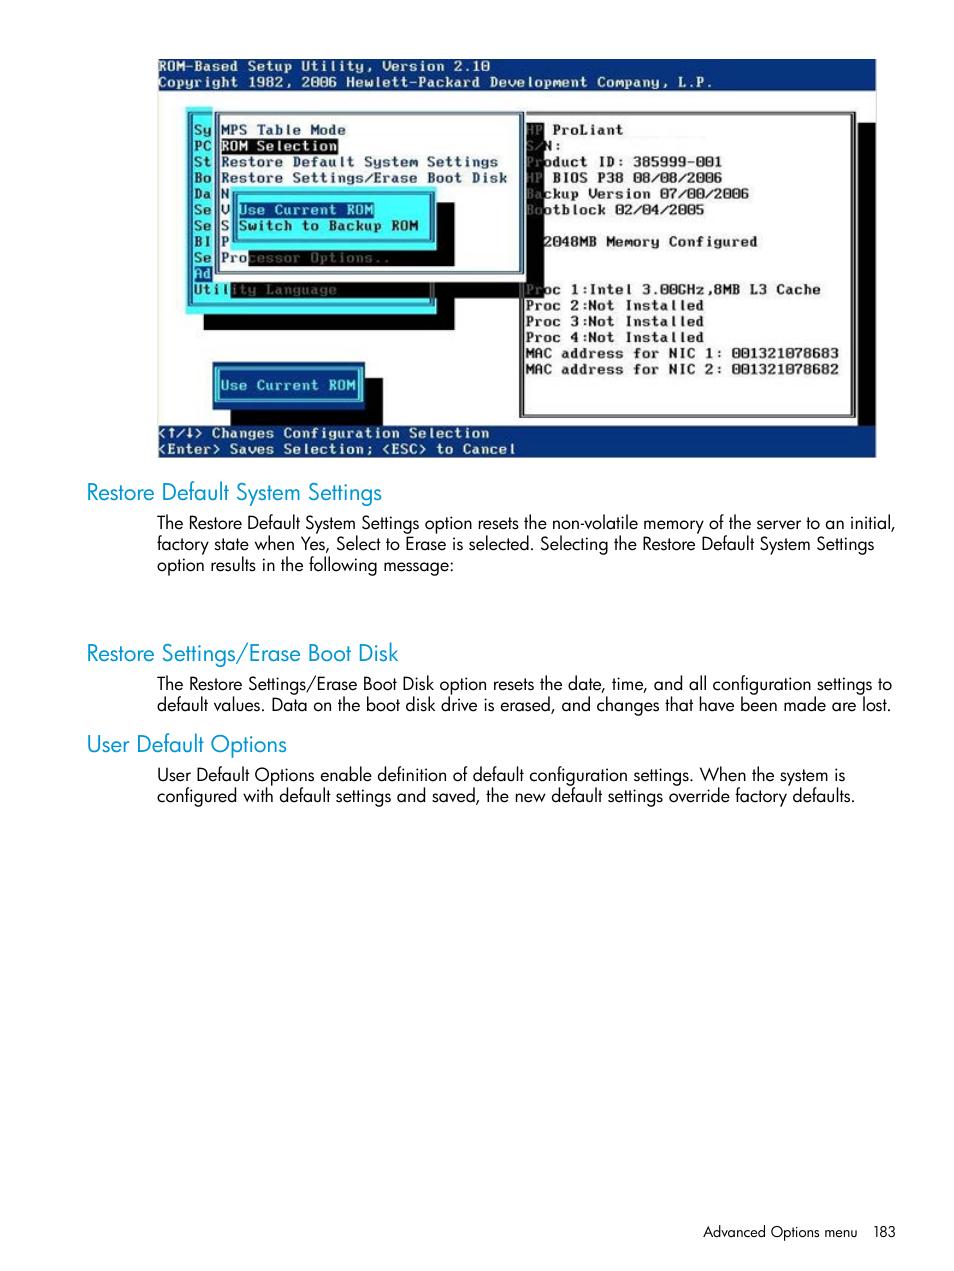 Restore default system settings, Restore settings/erase boot